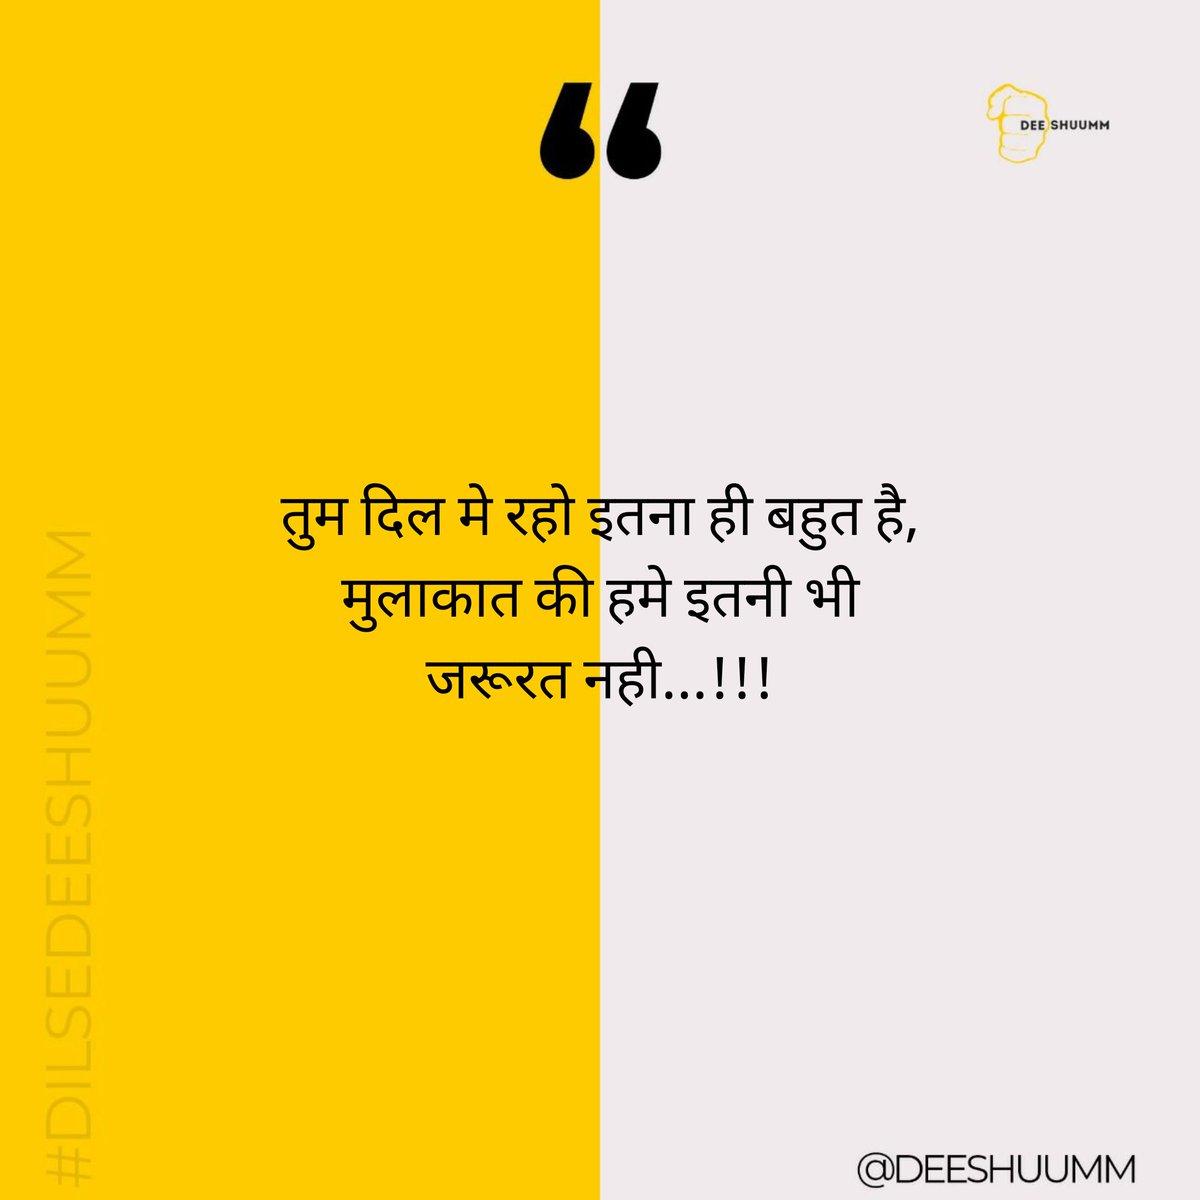 if you feel Connected RT Now! #shayari #love #poetry #urdu #urdupoetry #shayarilover #hindi #shayar #quotes #hindishayari #lovequotes #rekhta #follow #urdushayari #loveshayari #hindipoetry #ishq #poet #like  #shayri #poetrycommunity #instashayari #sad #poem #mohabbat #deeshuummpic.twitter.com/jdxL1otH8G